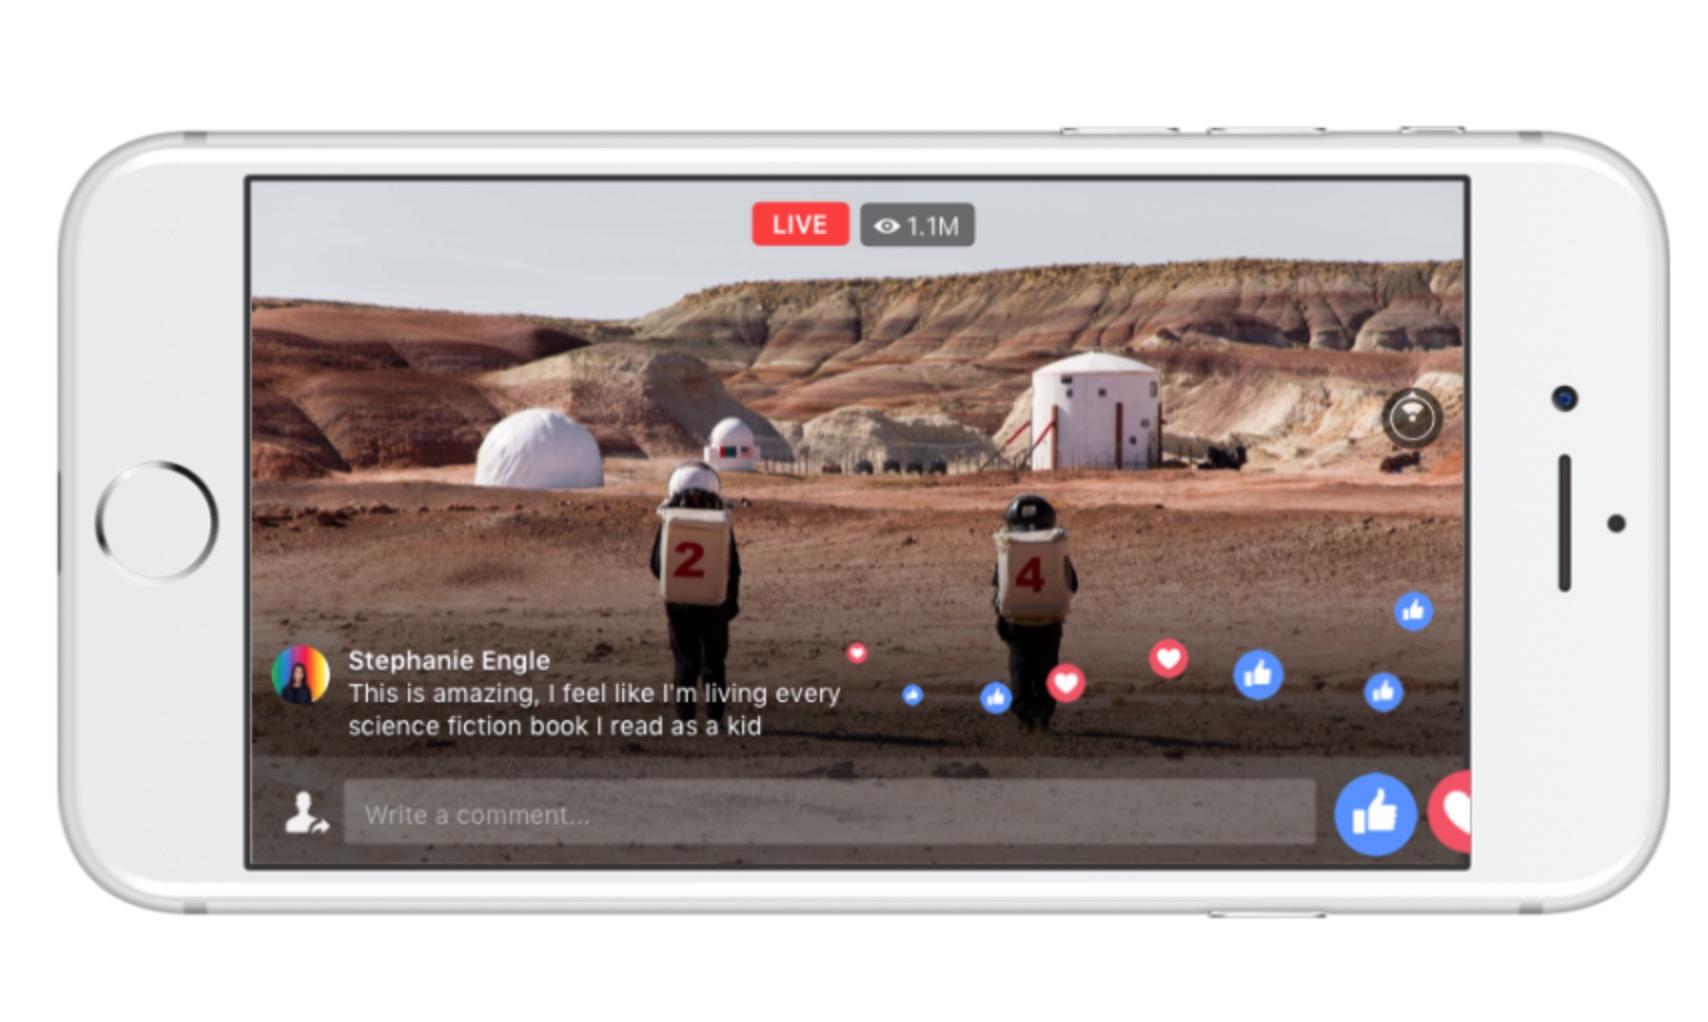 Facebook e National Geographic video live 360 gradi